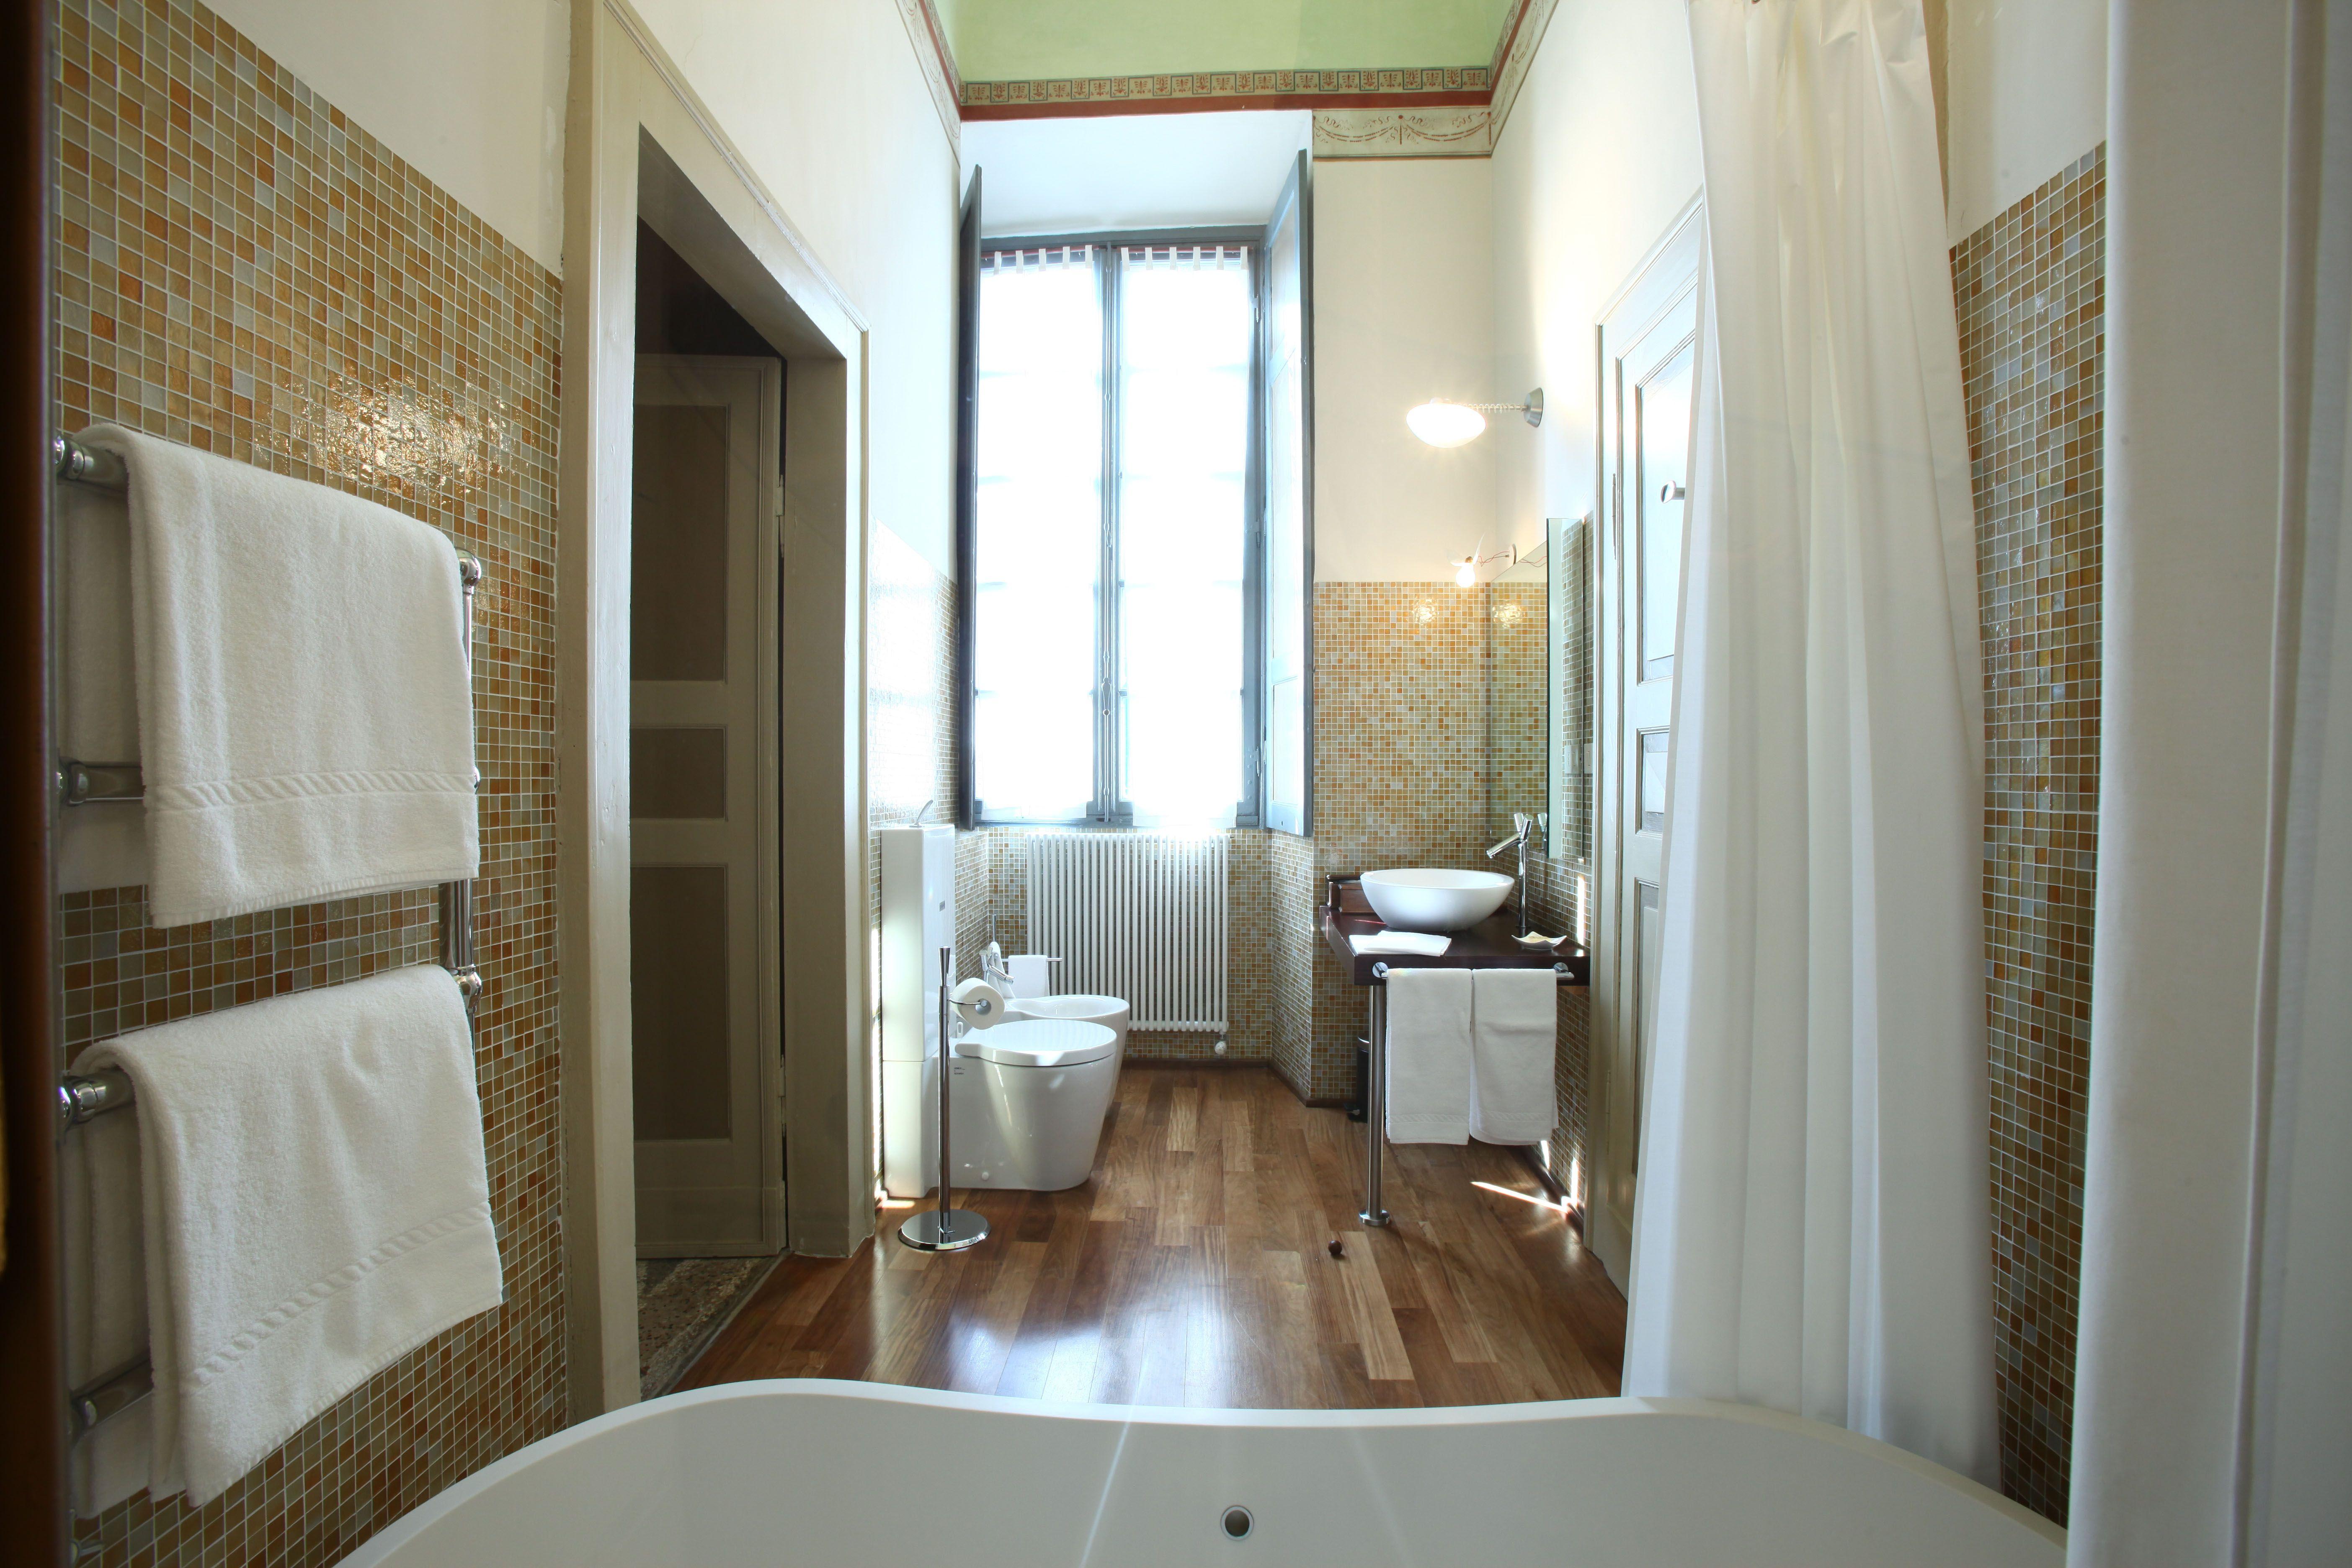 Suite Accomodation in Monterado Castle Holidays and Weddings